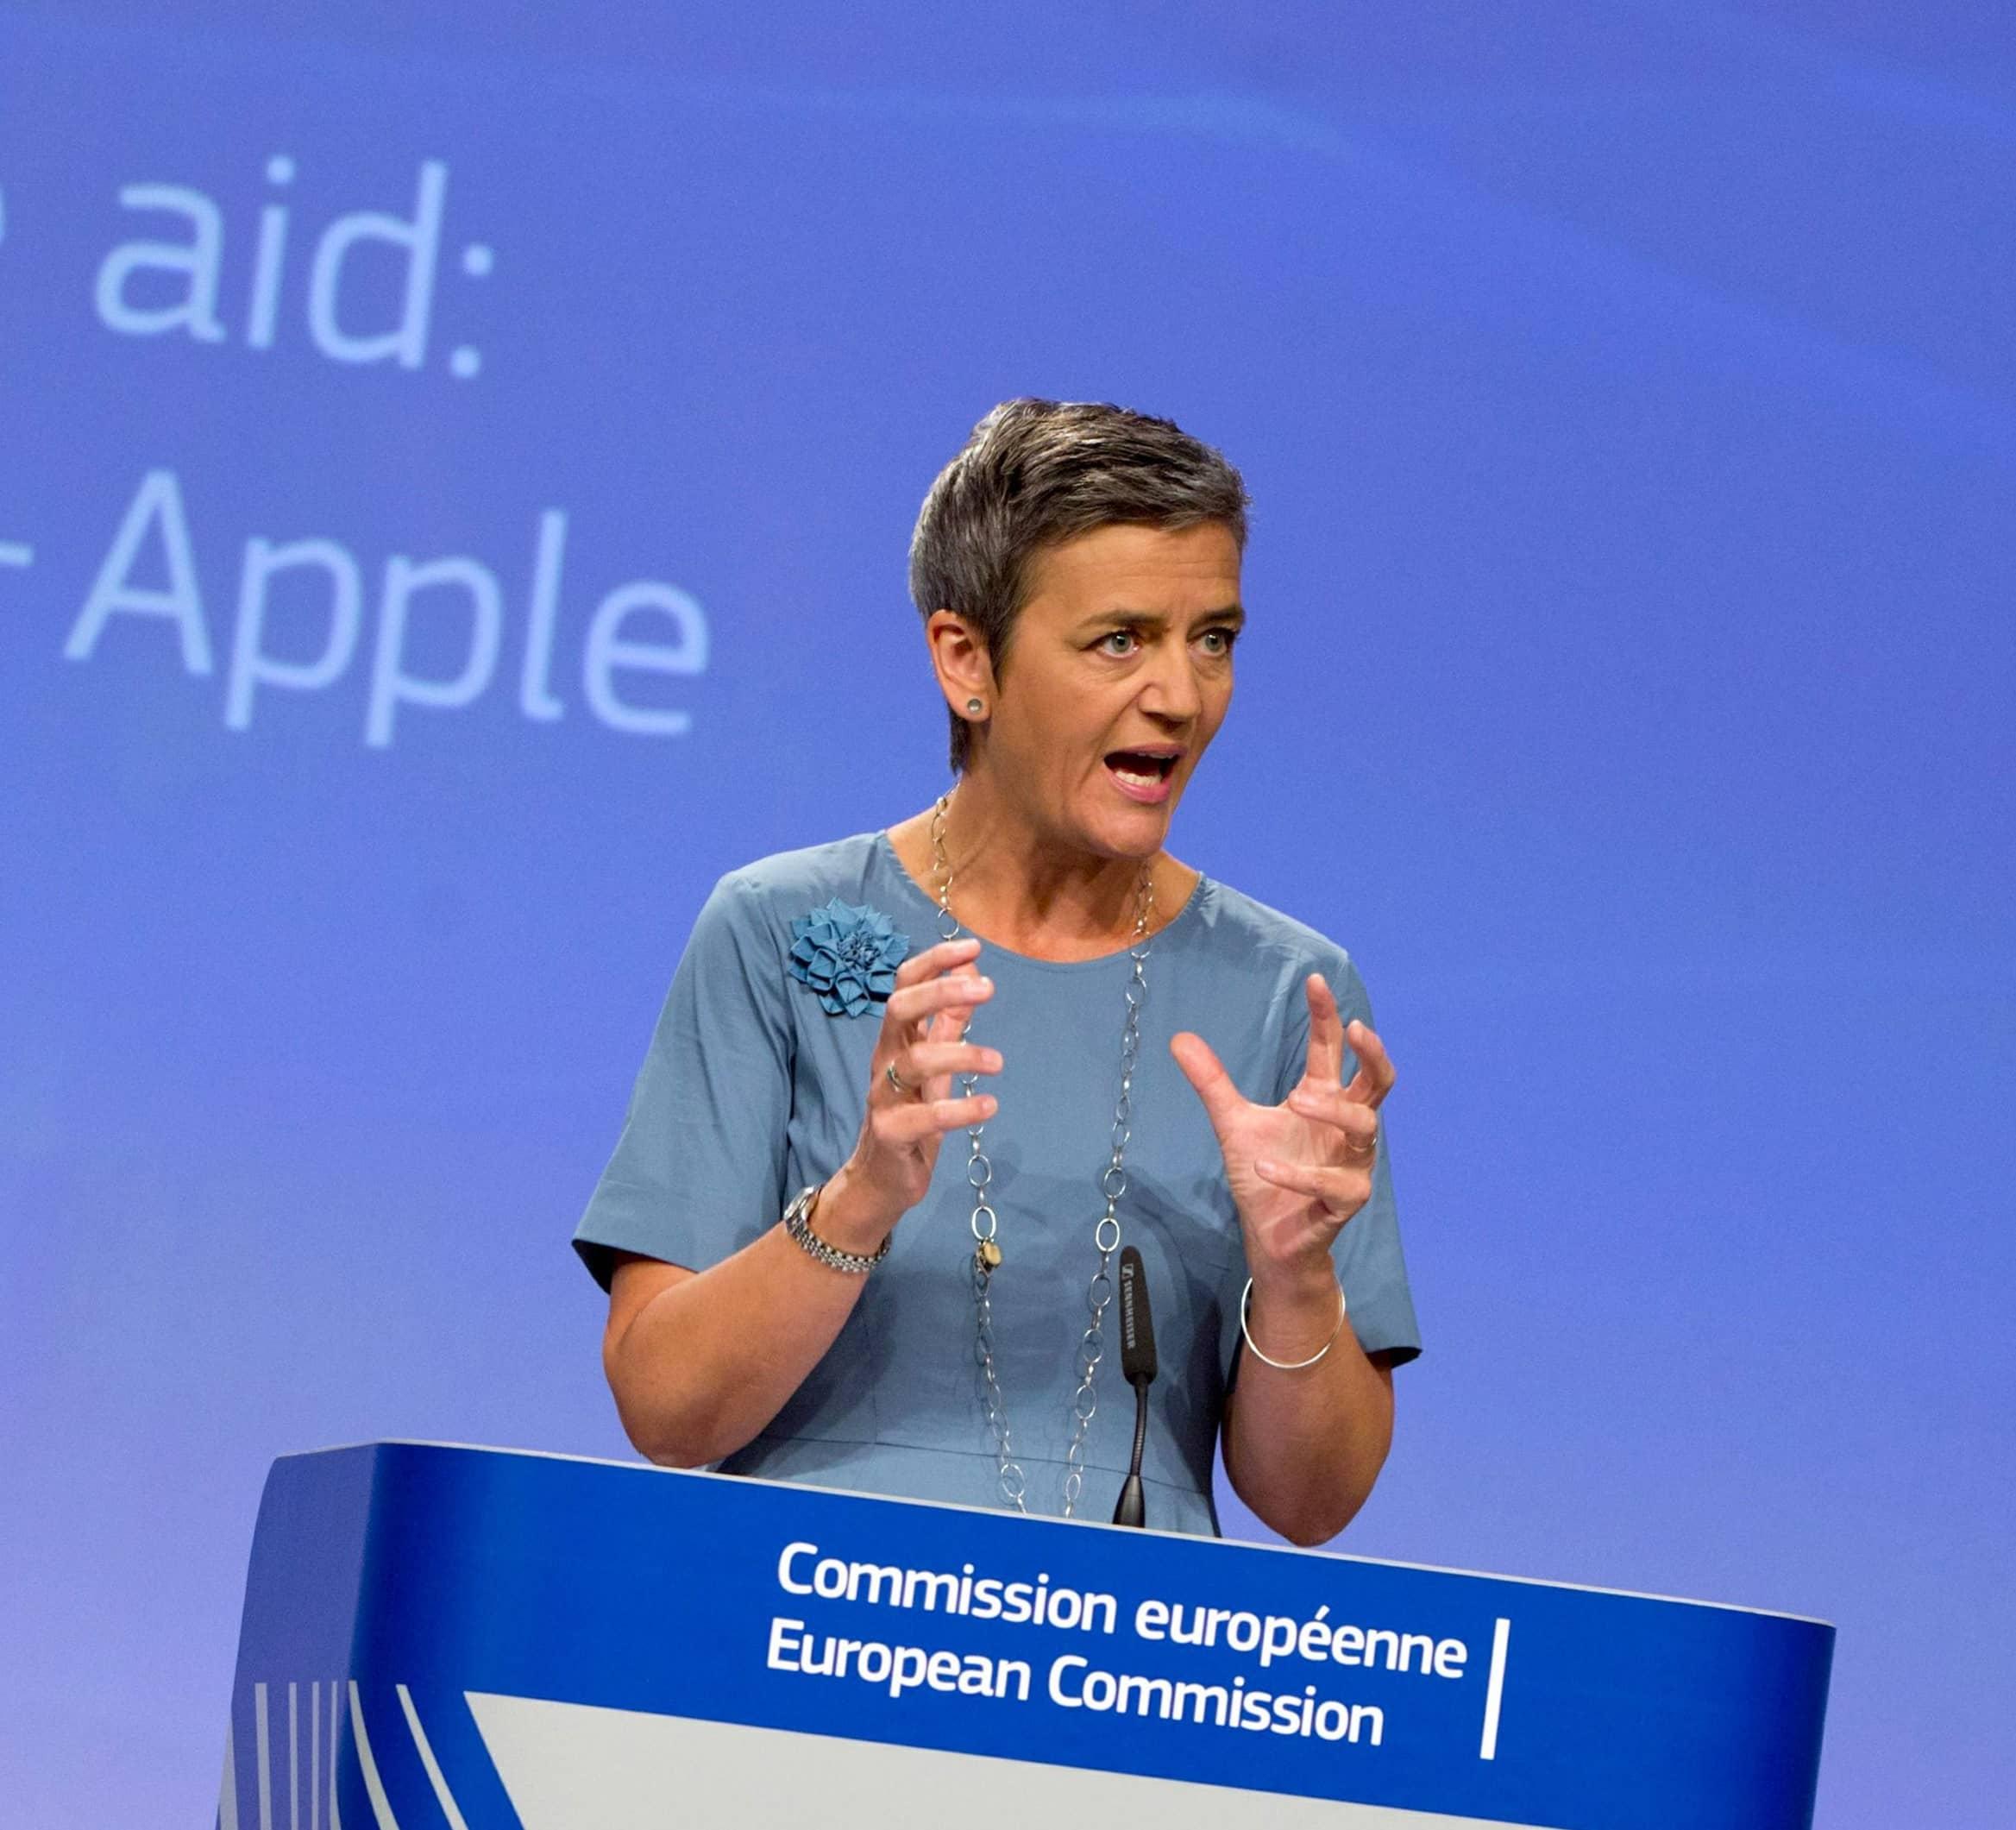 APPLE WINS BIG EU COURT CASE OVER $15 BILLION IN TAXES